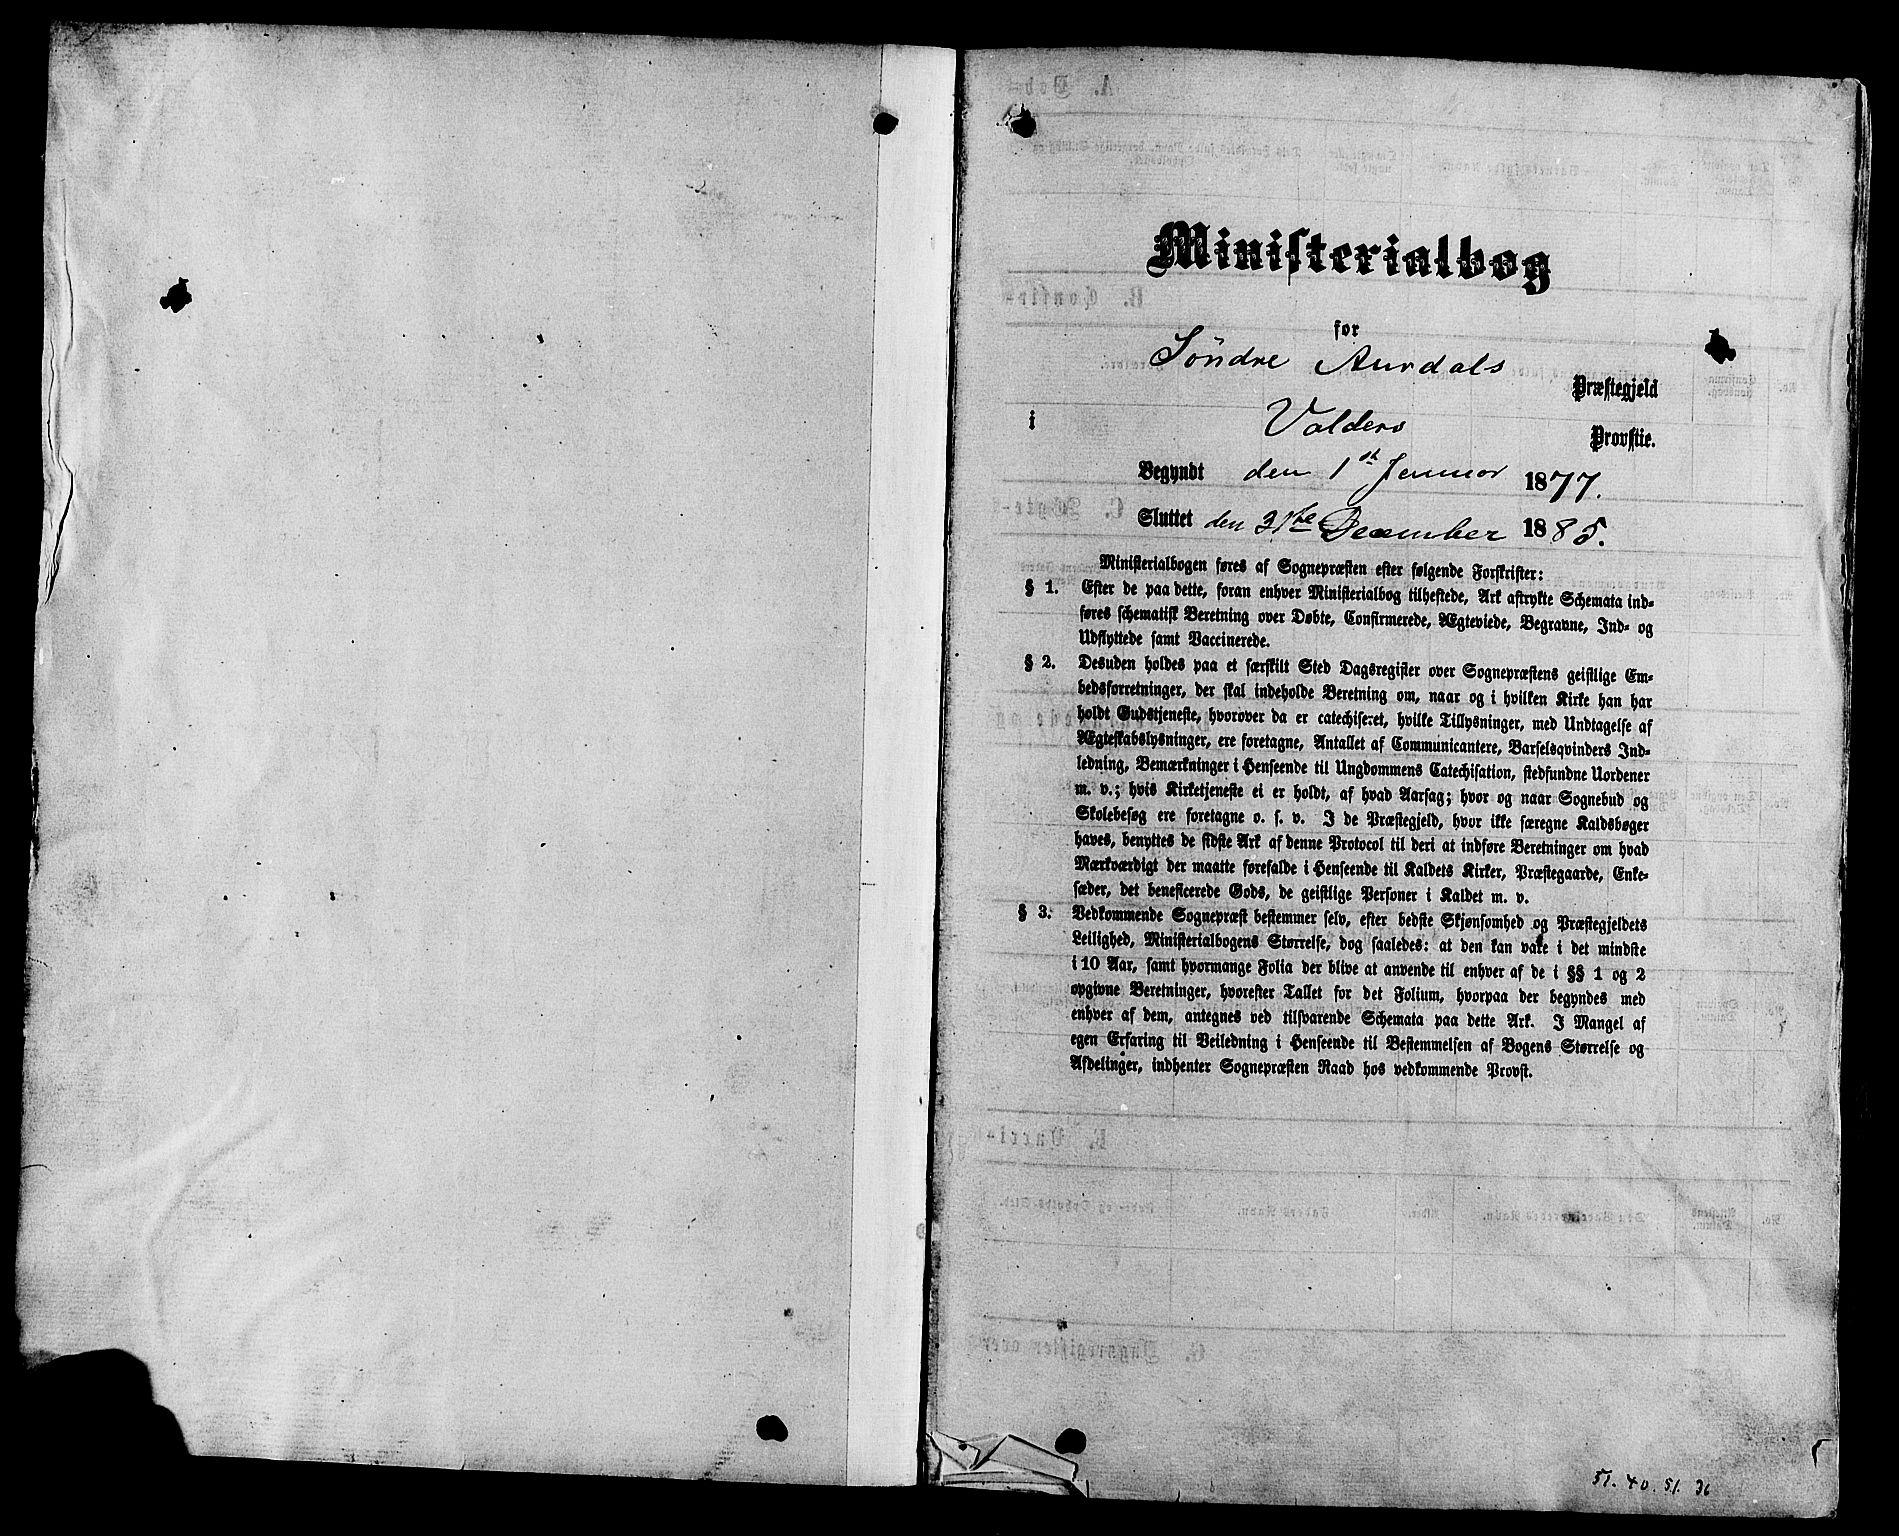 SAH, Sør-Aurdal prestekontor, Parish register (official) no. 8, 1877-1885